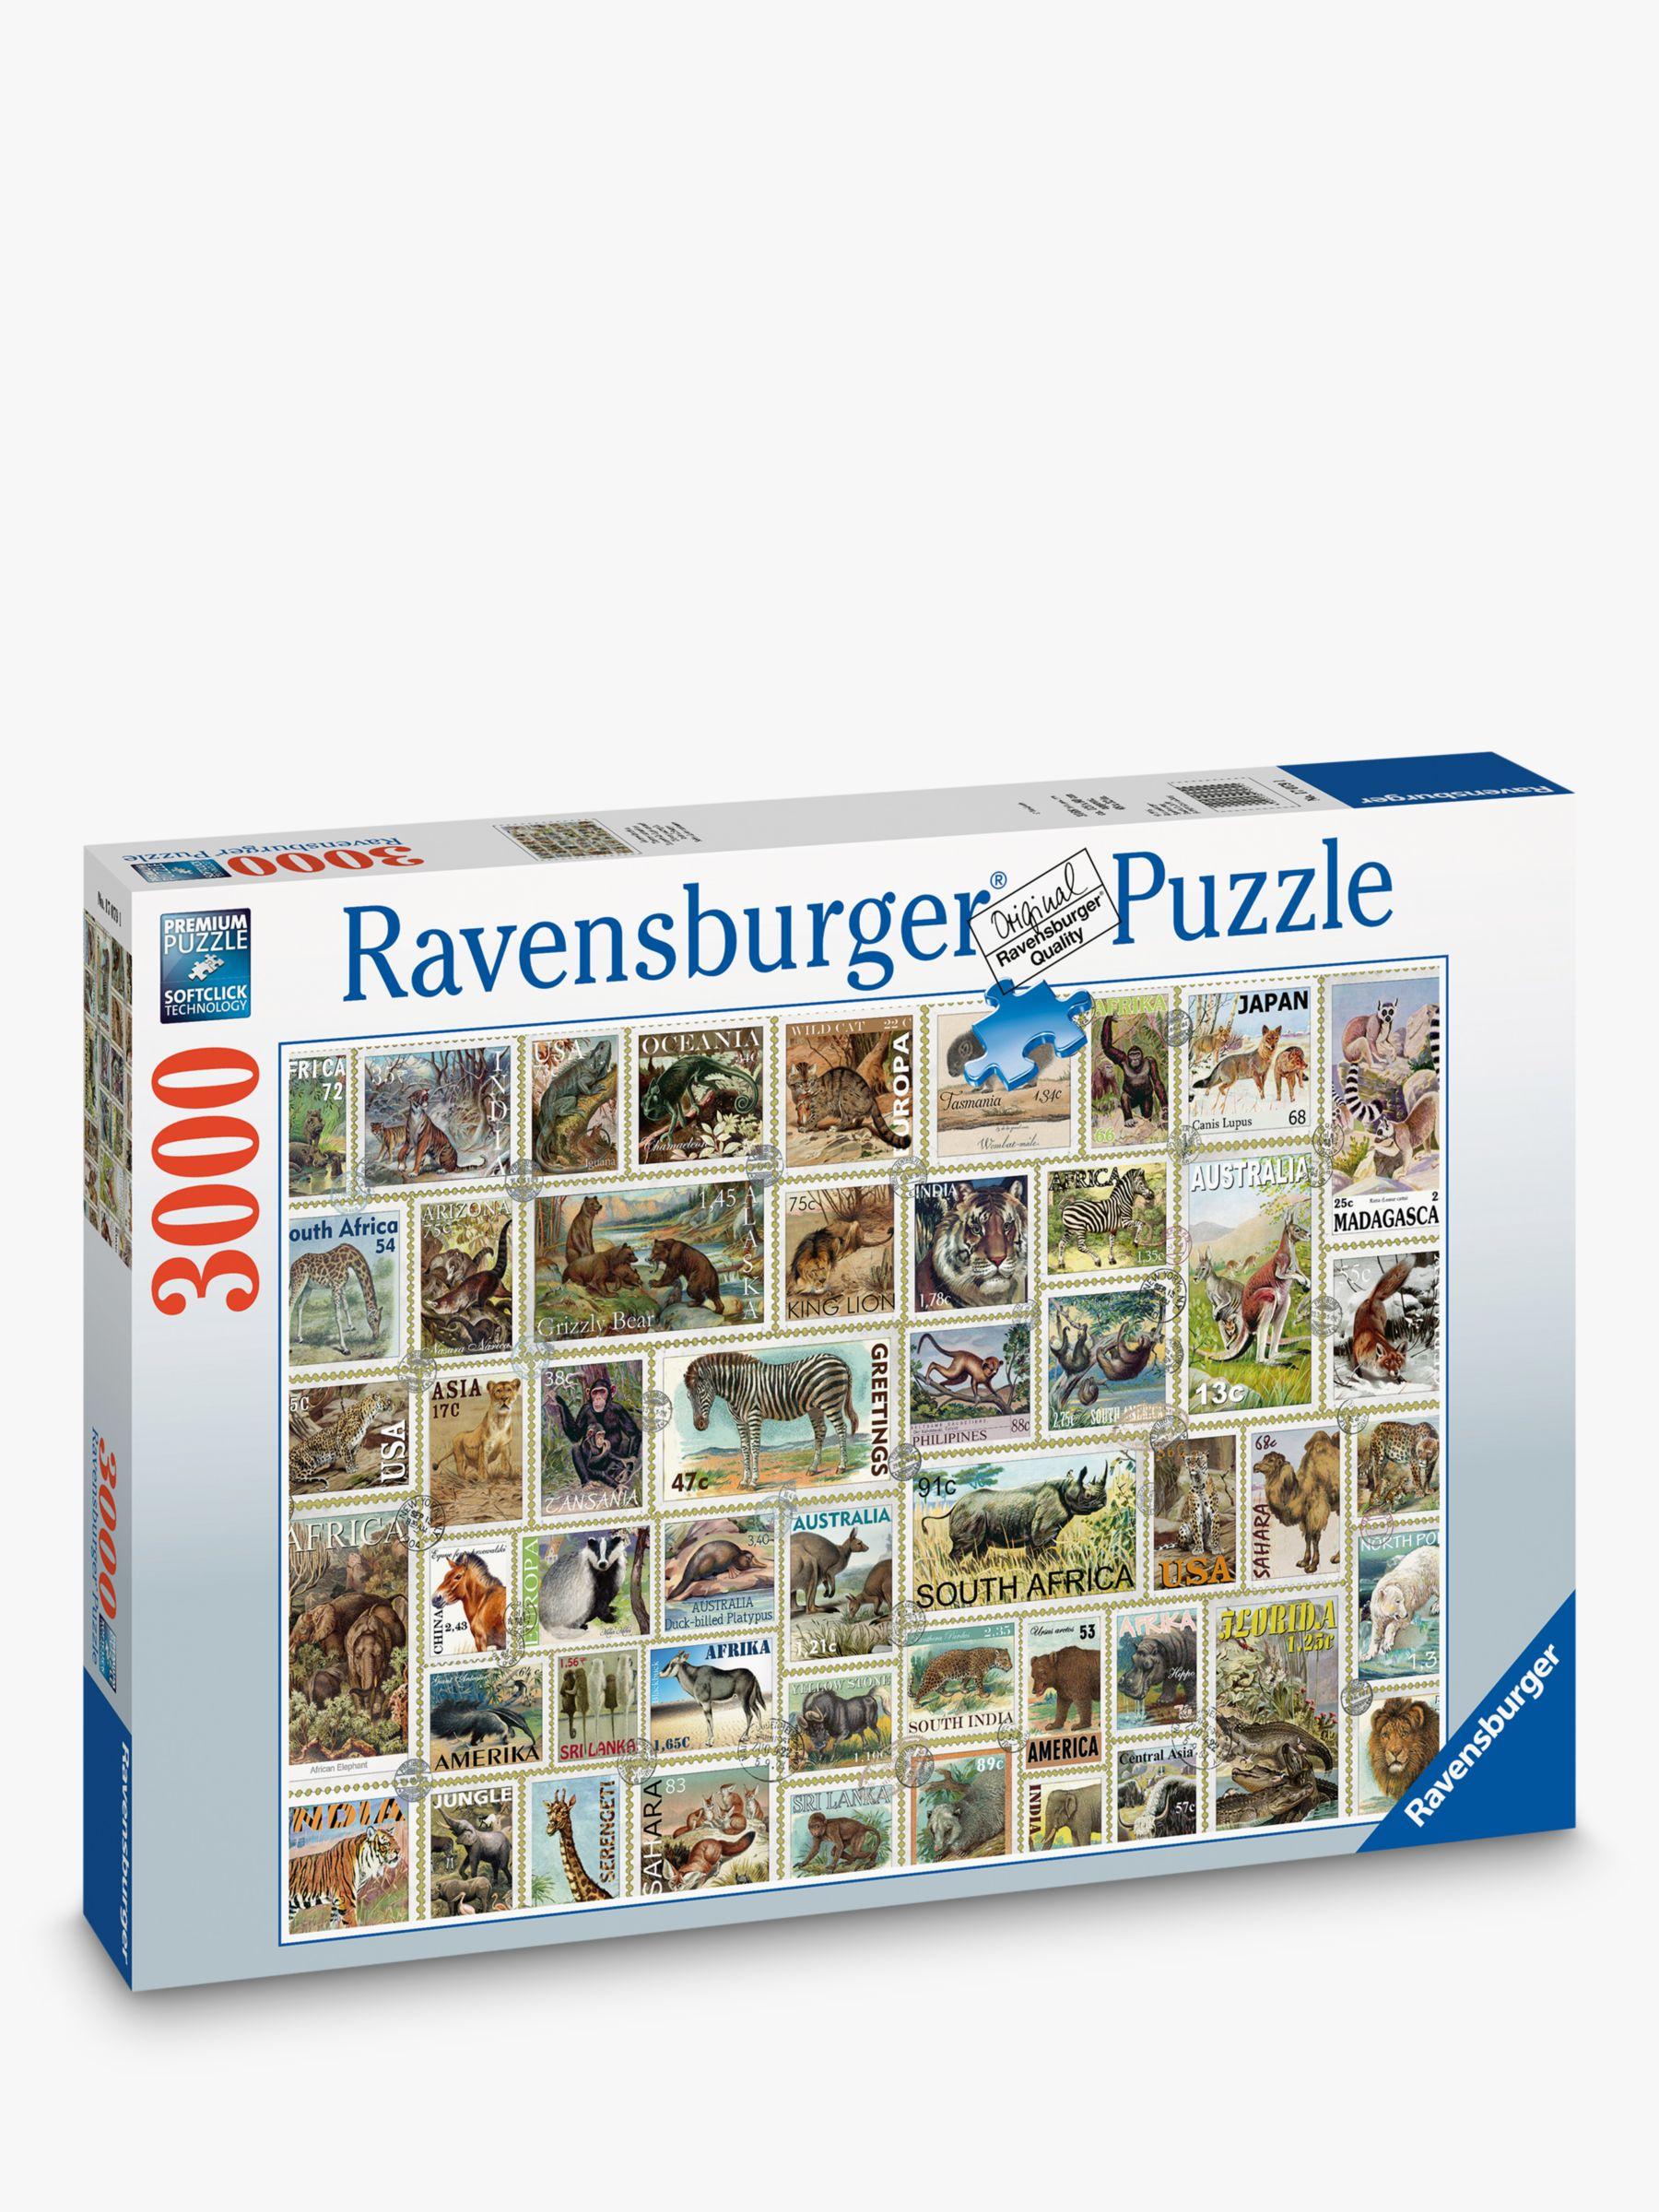 Ravensburger Ravensburger Animal Stamps Jigsaw Puzzle, 3000 Pieces